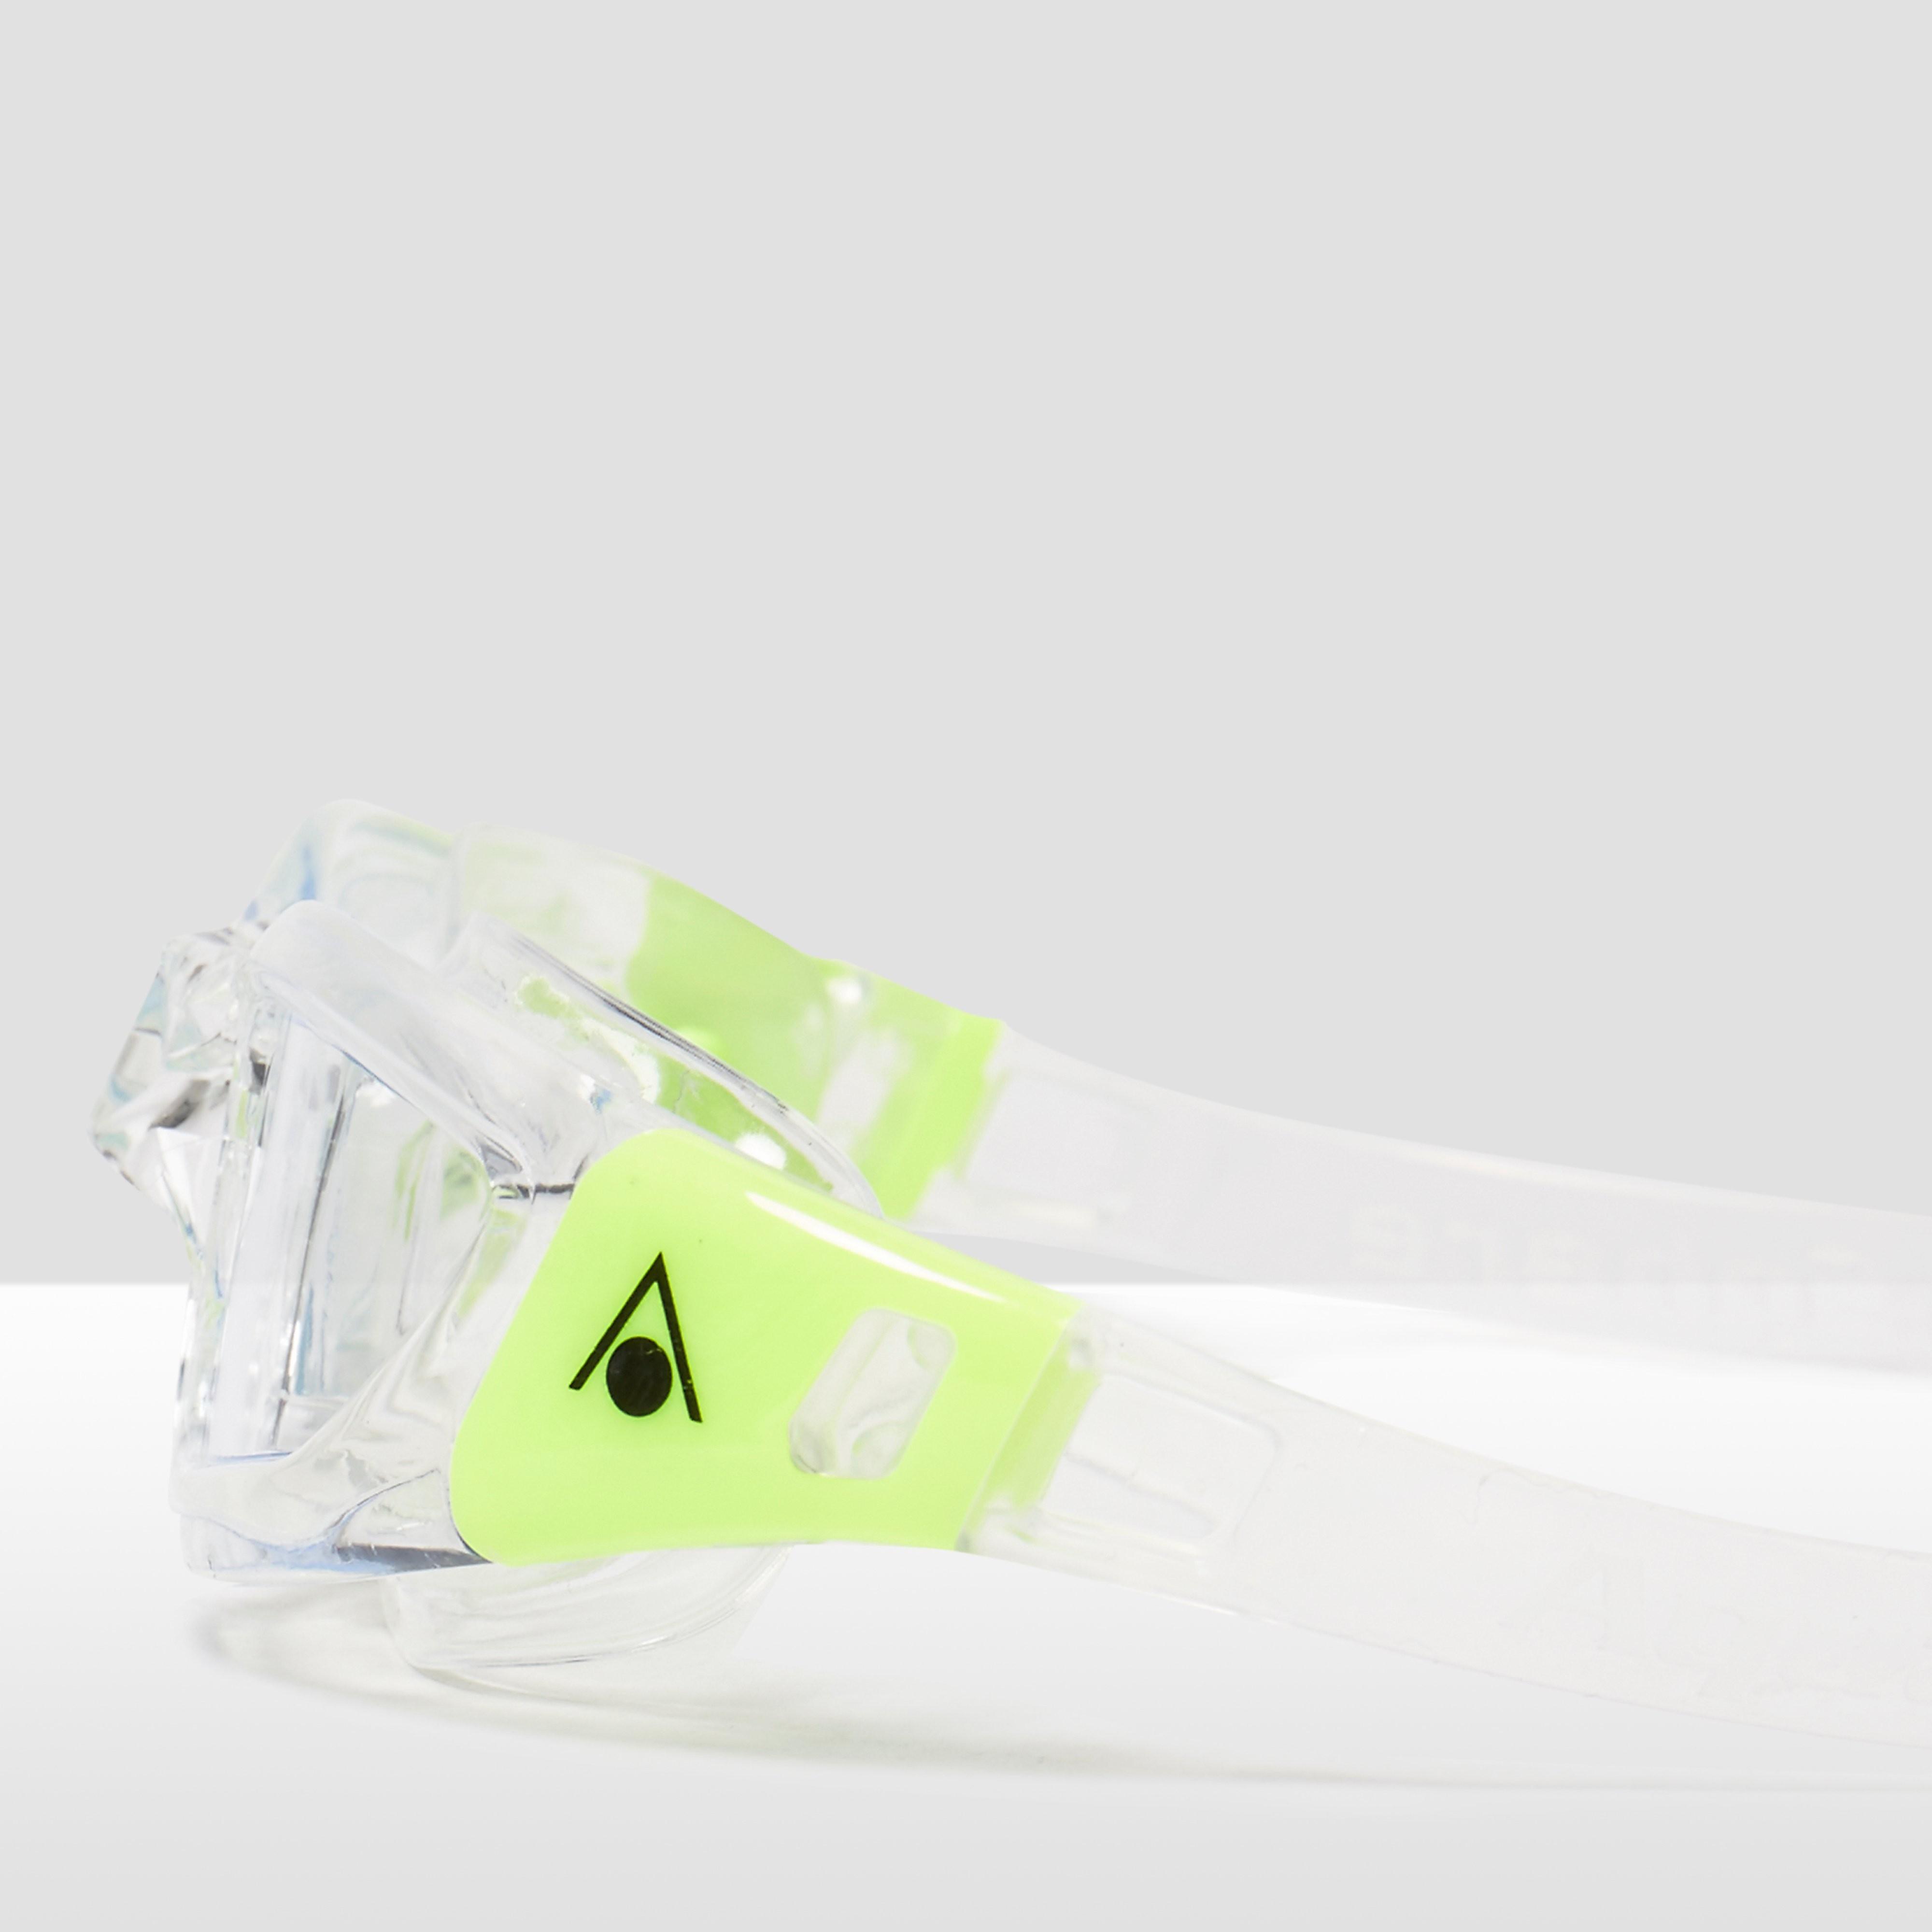 Aqua Sphere Kameleon Clear Lens Swimming Goggles